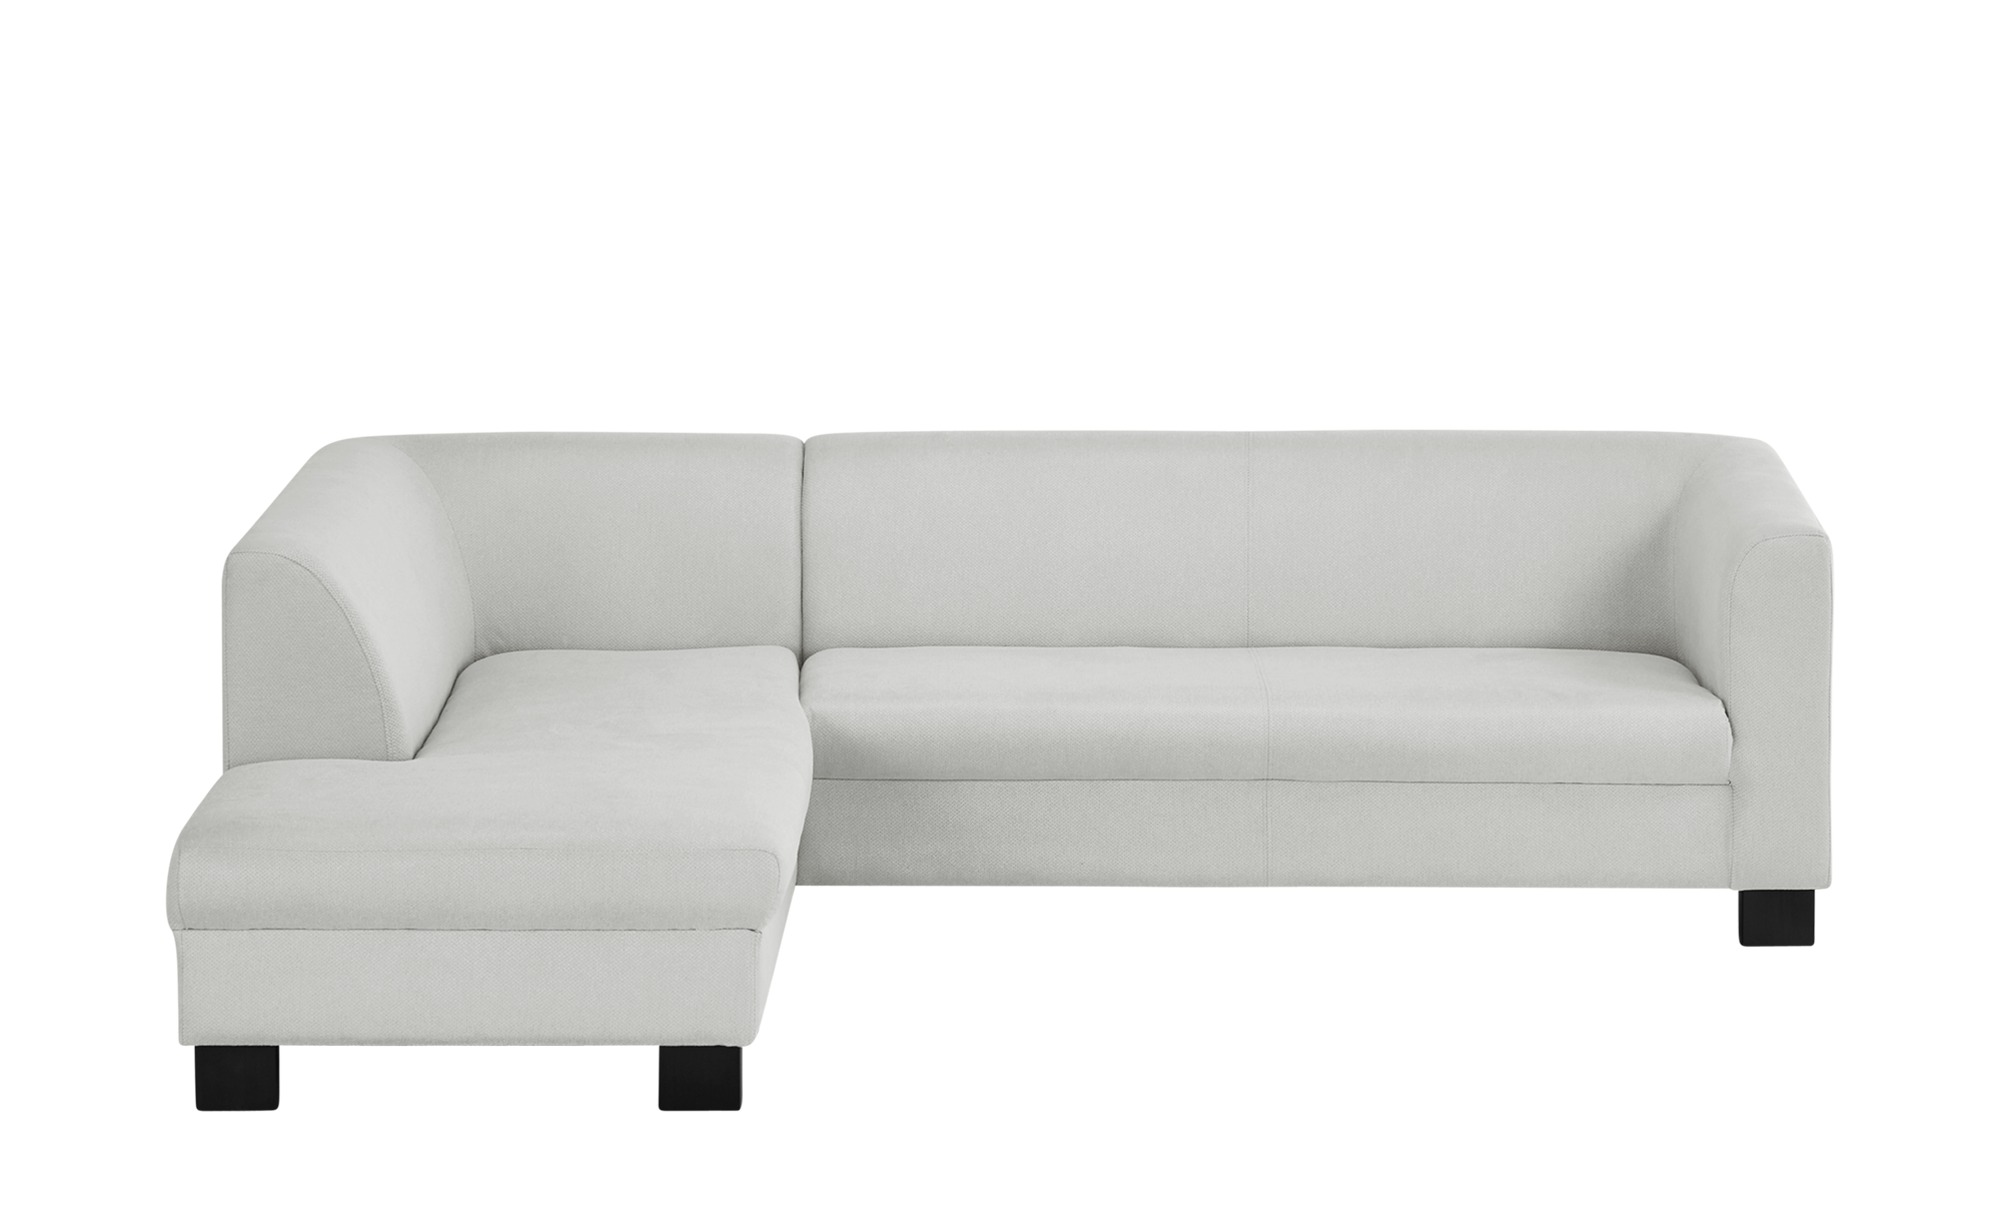 Smart Ecksofa Tiffy Schlafsofa Gunstig Design Schlafsofa Sofa